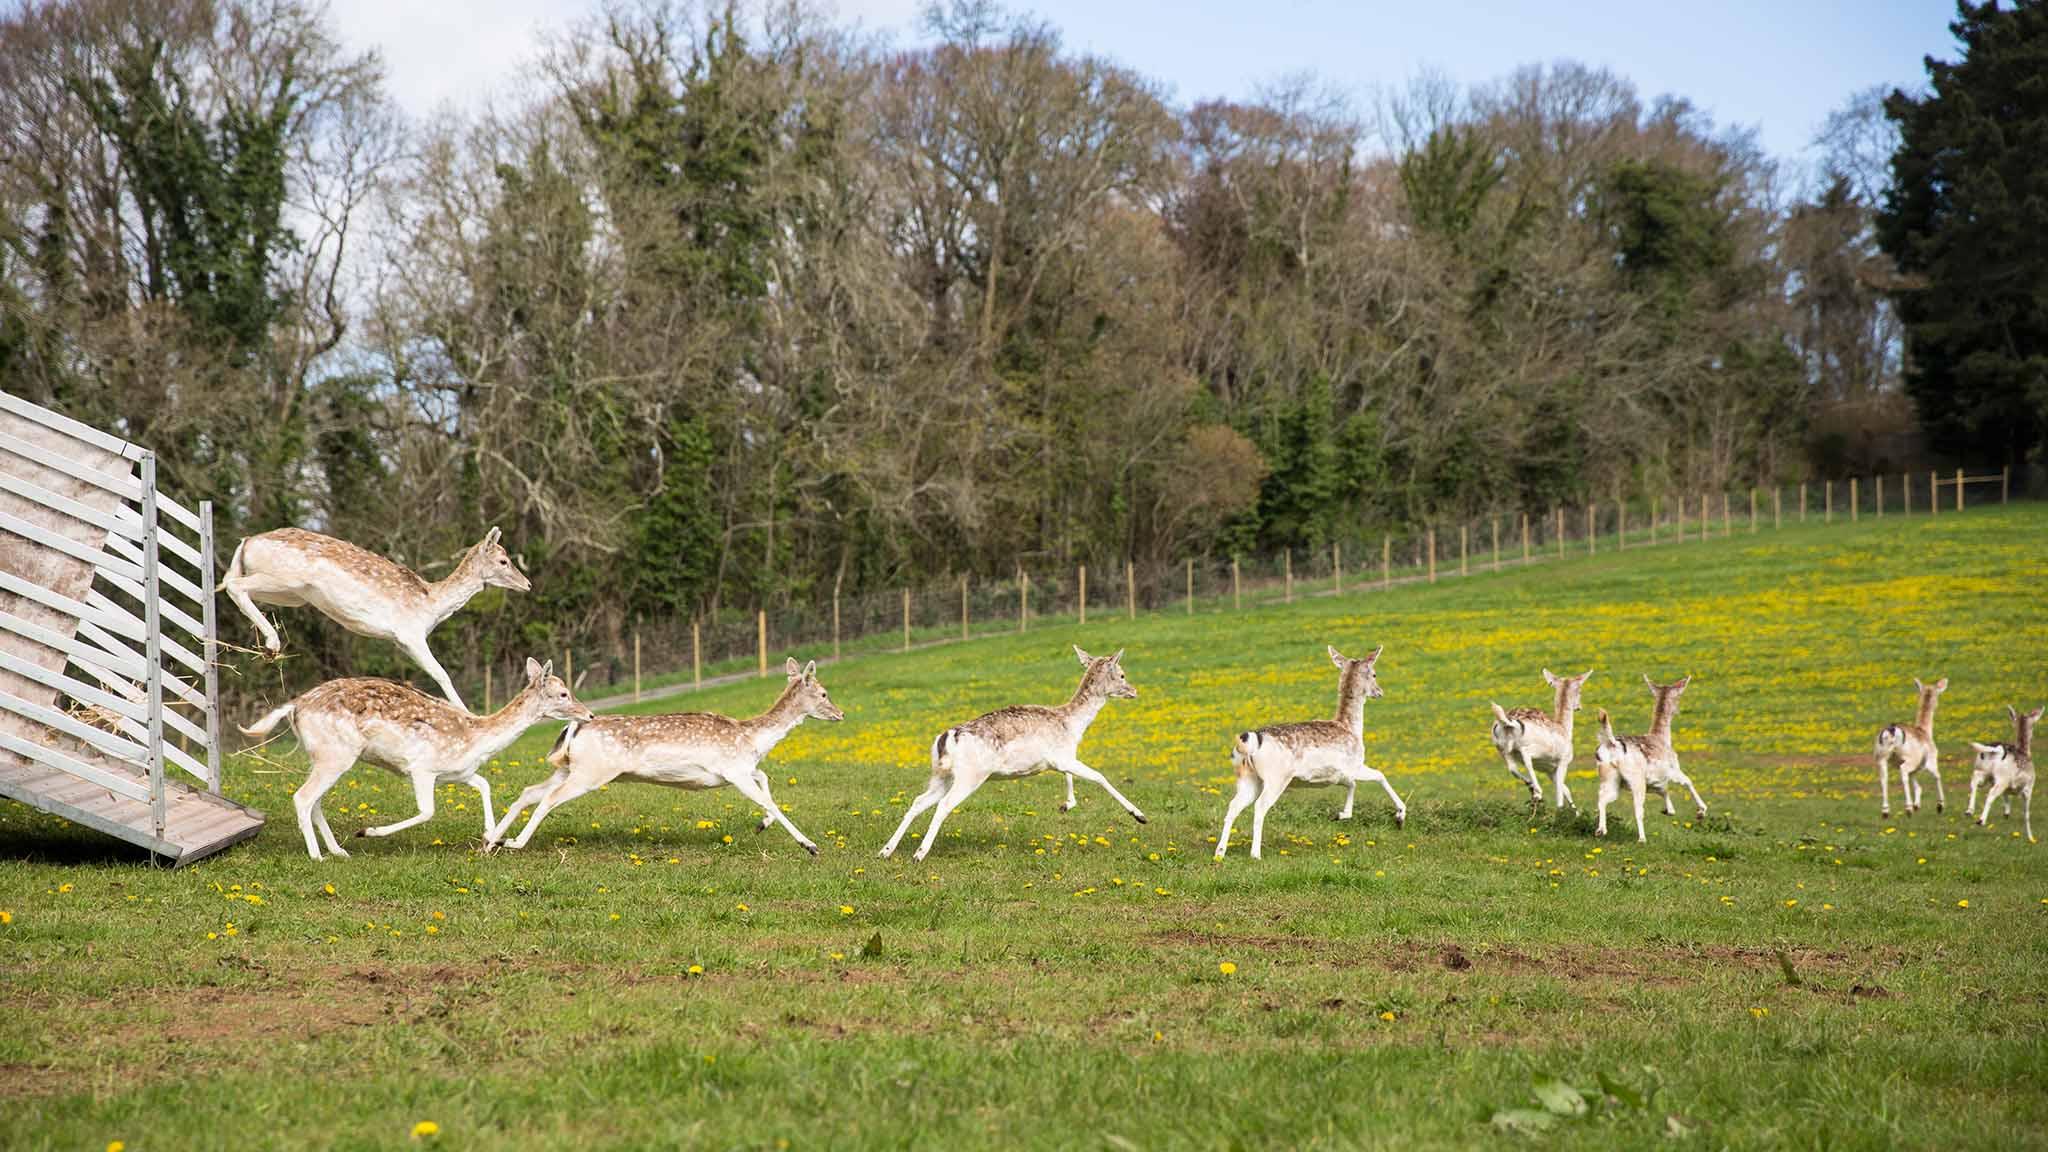 Fallow deer arrive at Dartington. Photo: Into the Woods Photography